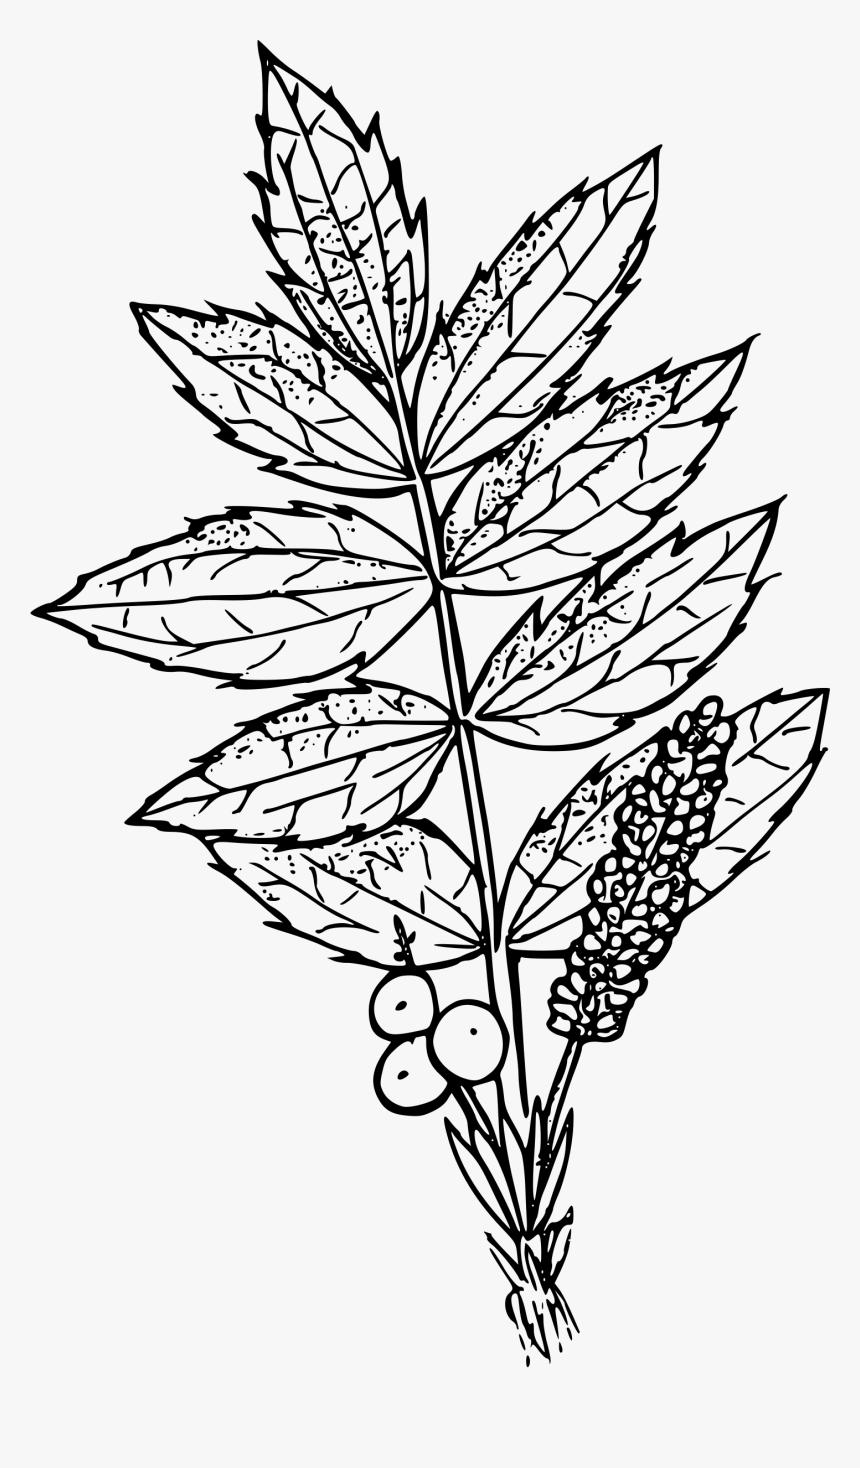 Cascades Oregon Grape Icons - Oregon Grape Flower Drawing, HD Png Download, Free Download